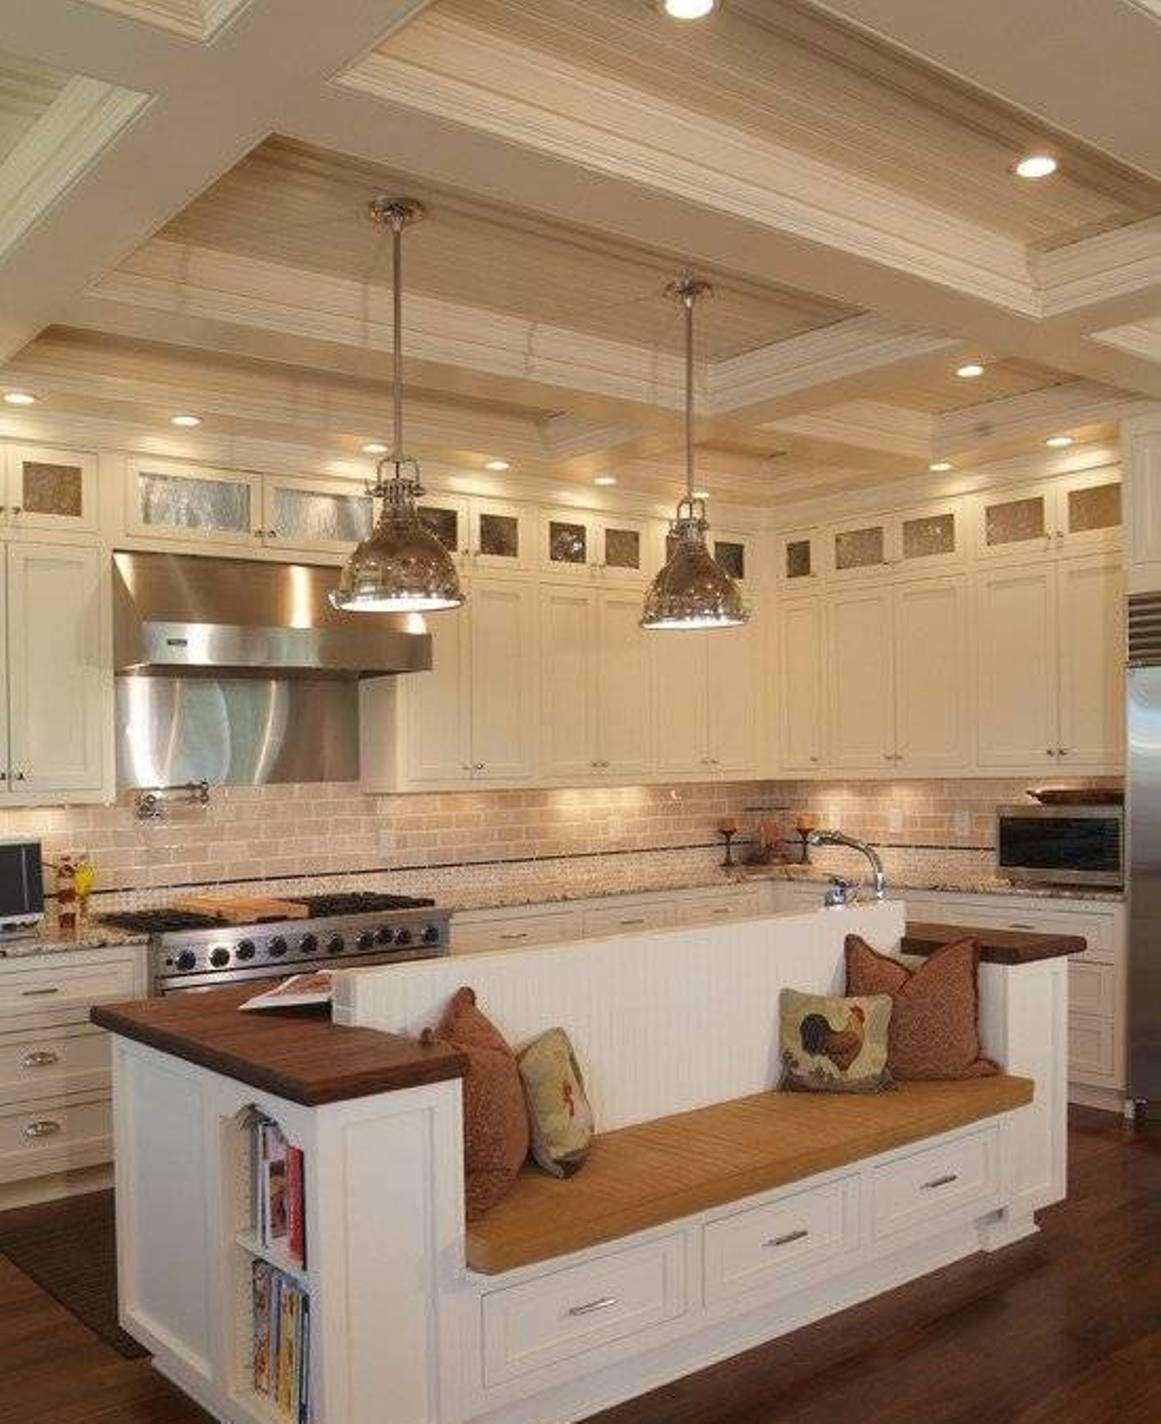 Kitchen , Built In Seating Kitchen Benches : Built In Seating Kitchen Bench Island